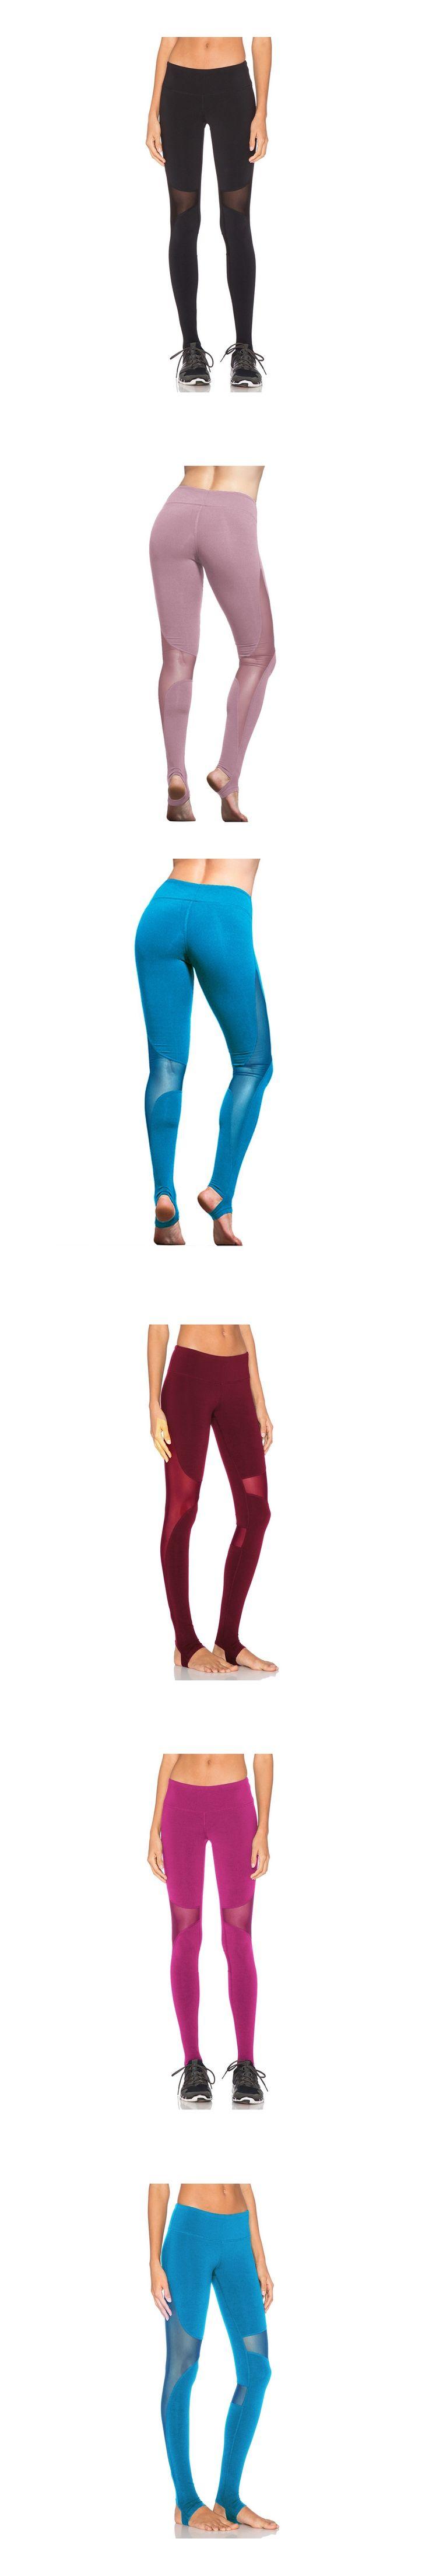 Women Sport Fitness Leggings High Rise Elastic Gym Capris Mesh Insert Tight Leggings Workout Tights Yoga Pants for Women